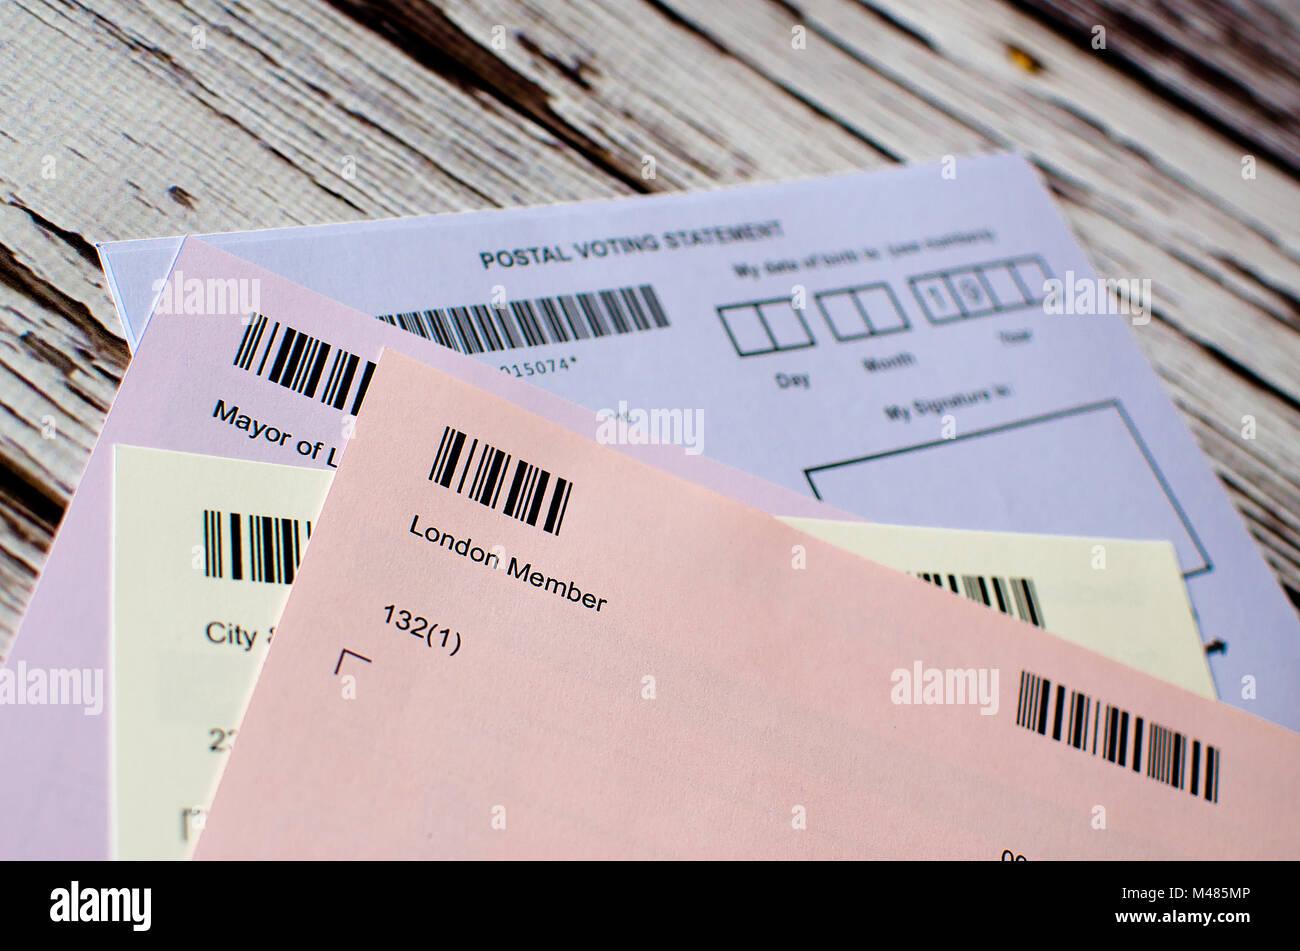 postal voting London UK - Stock Image